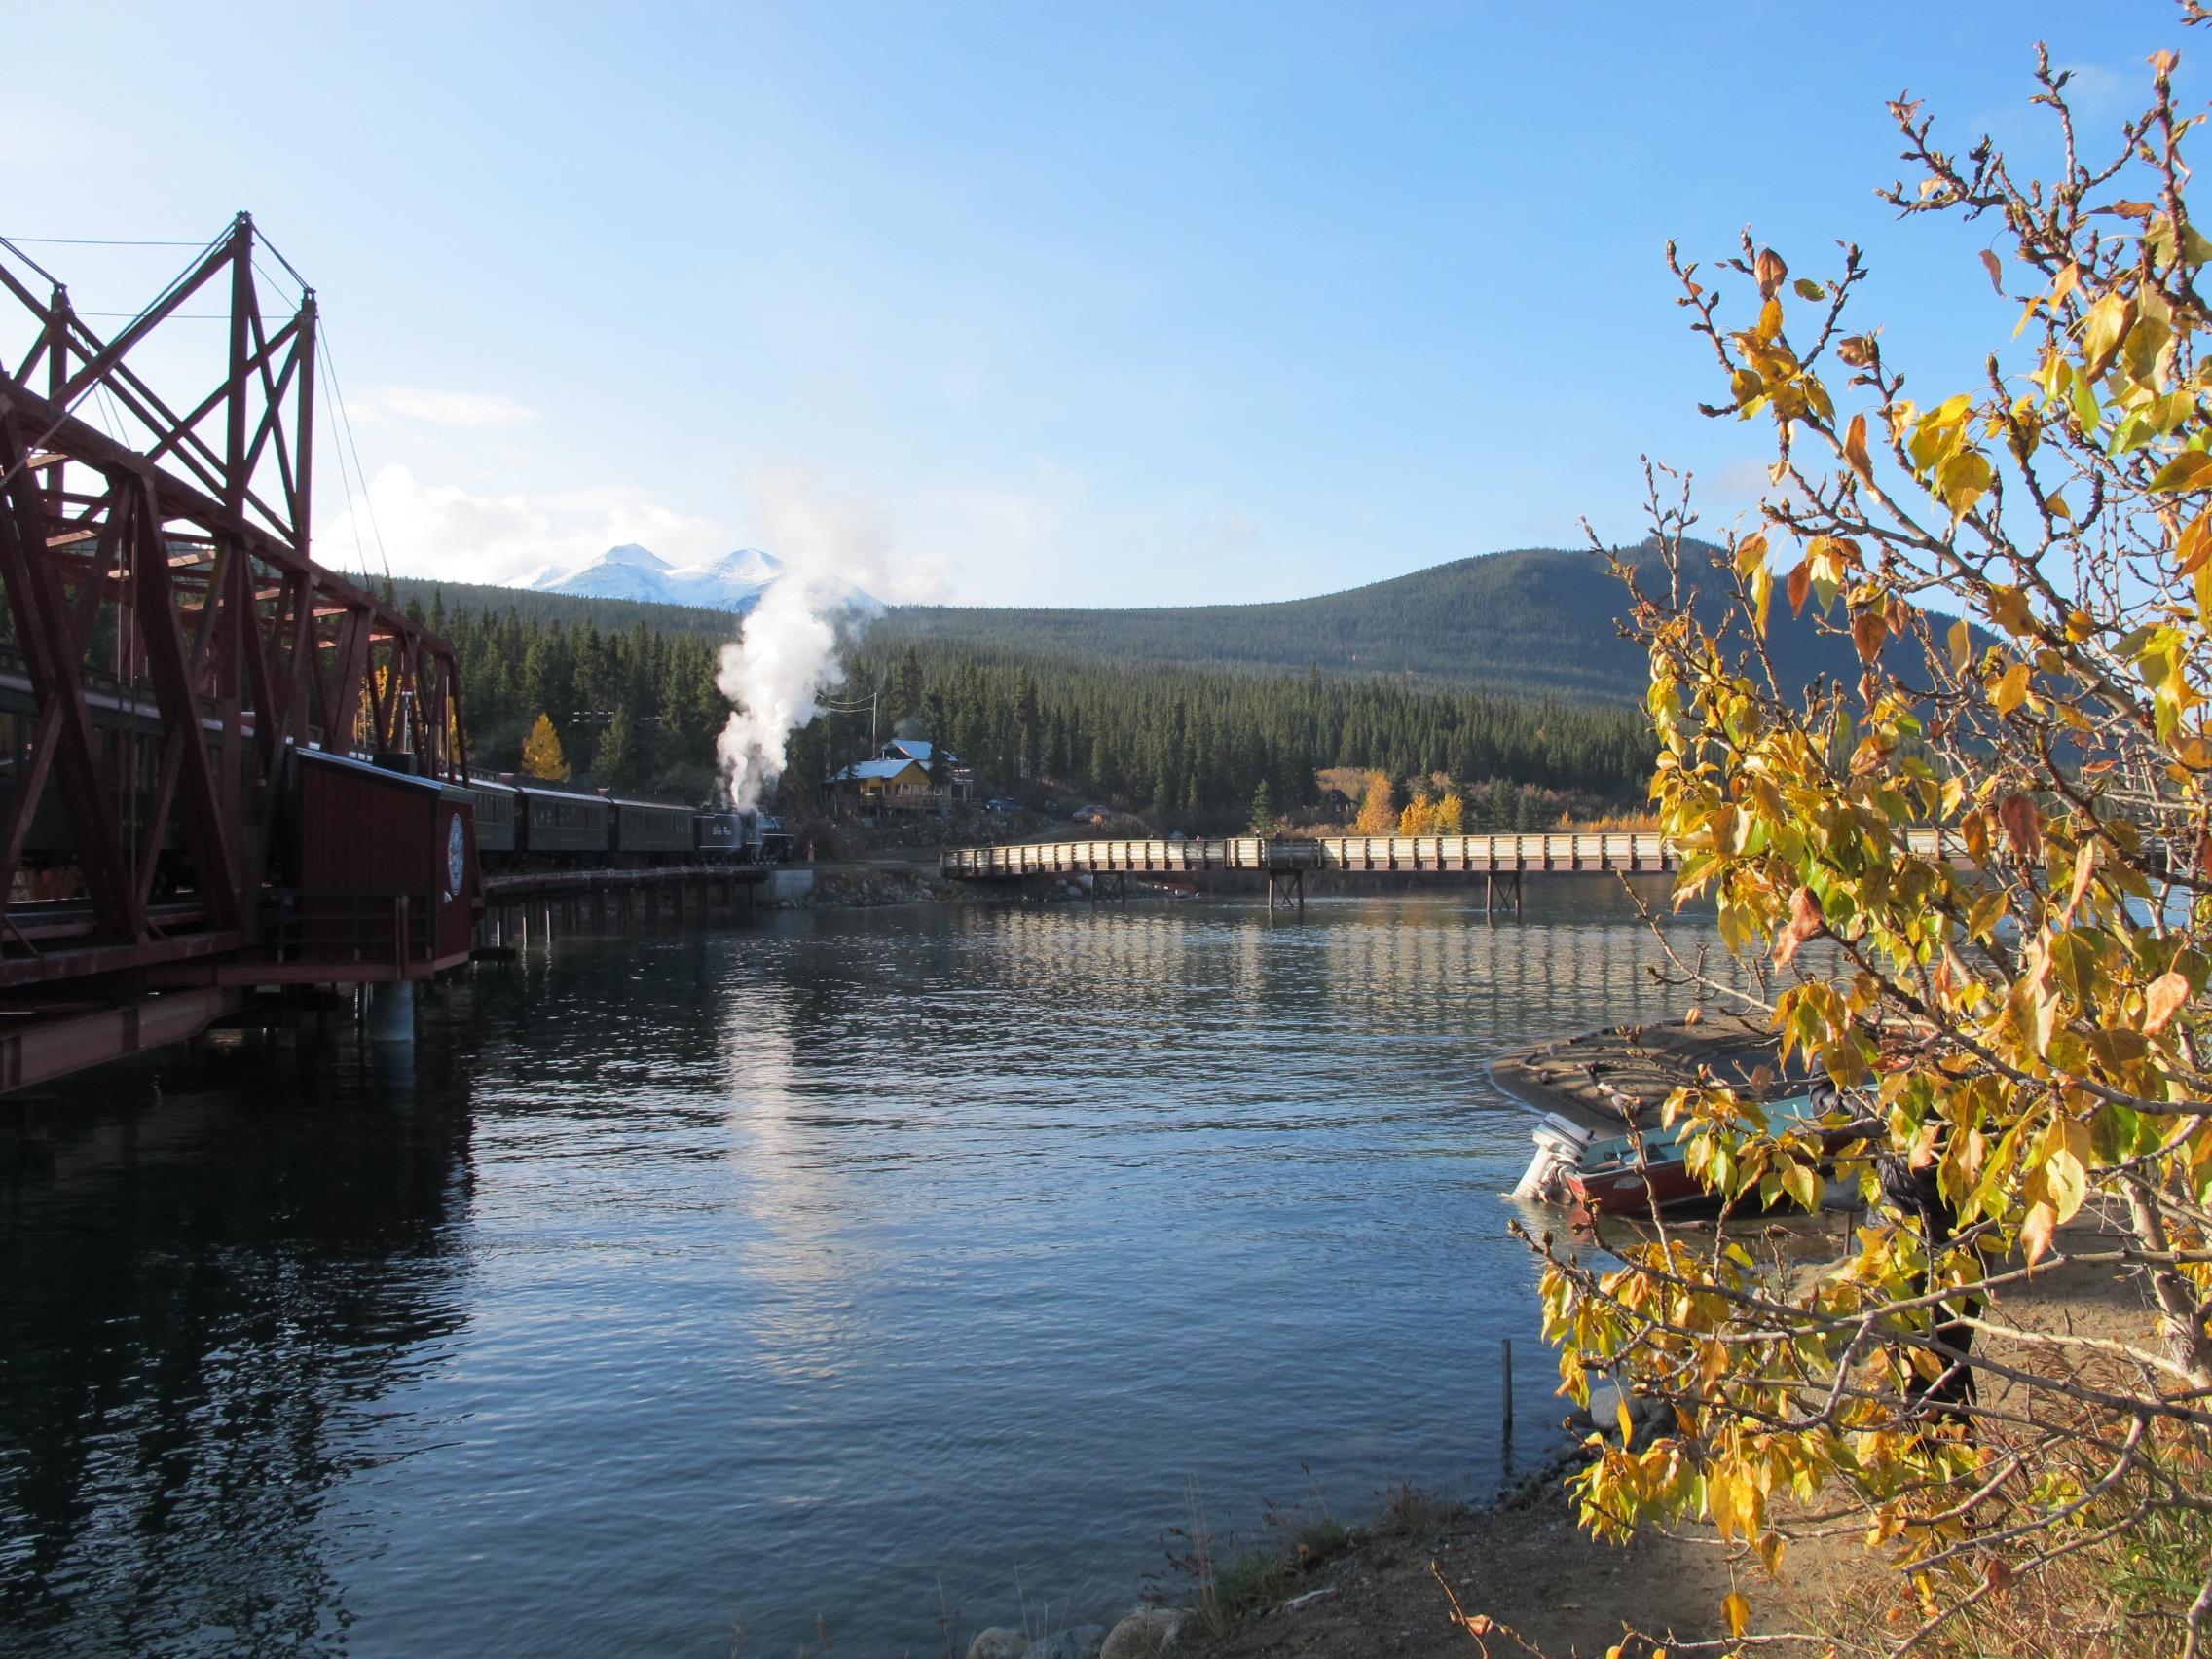 Carcross bridge and White Pass steam train